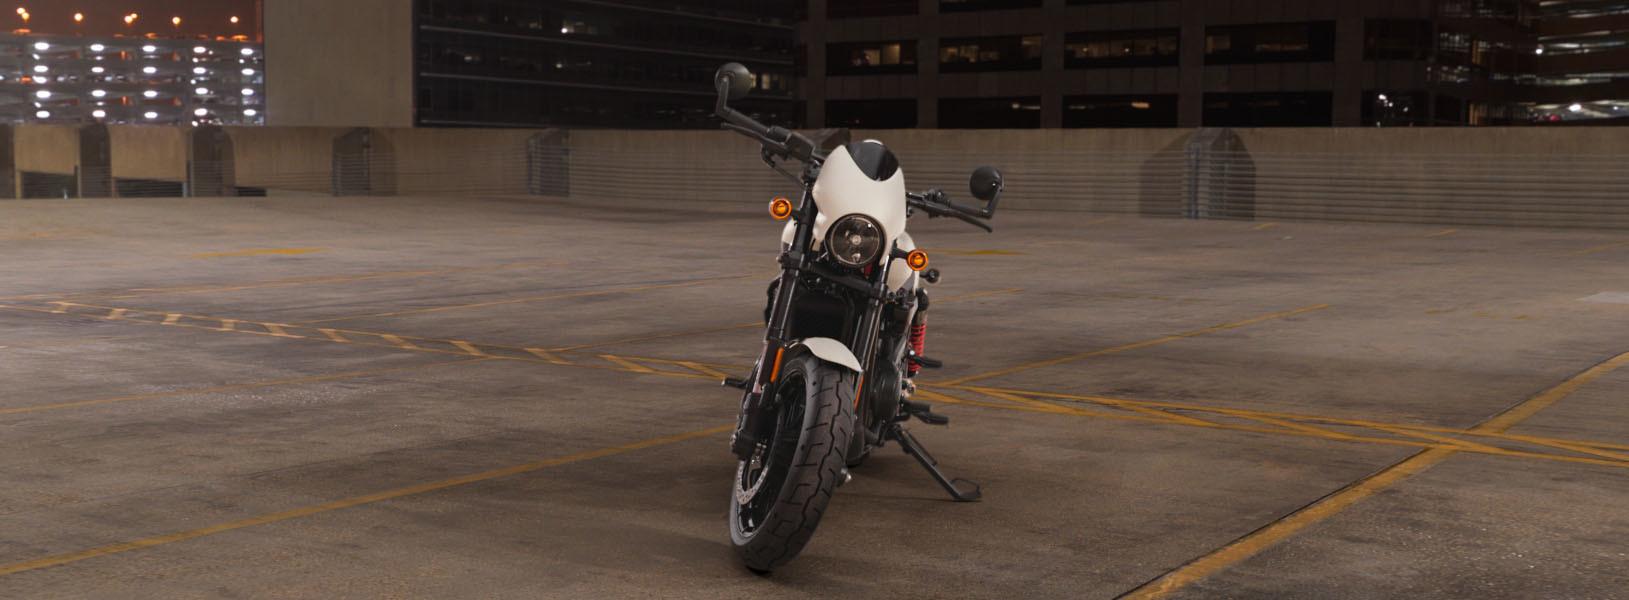 Street Rod™ | Electric City Harley-Davidson®